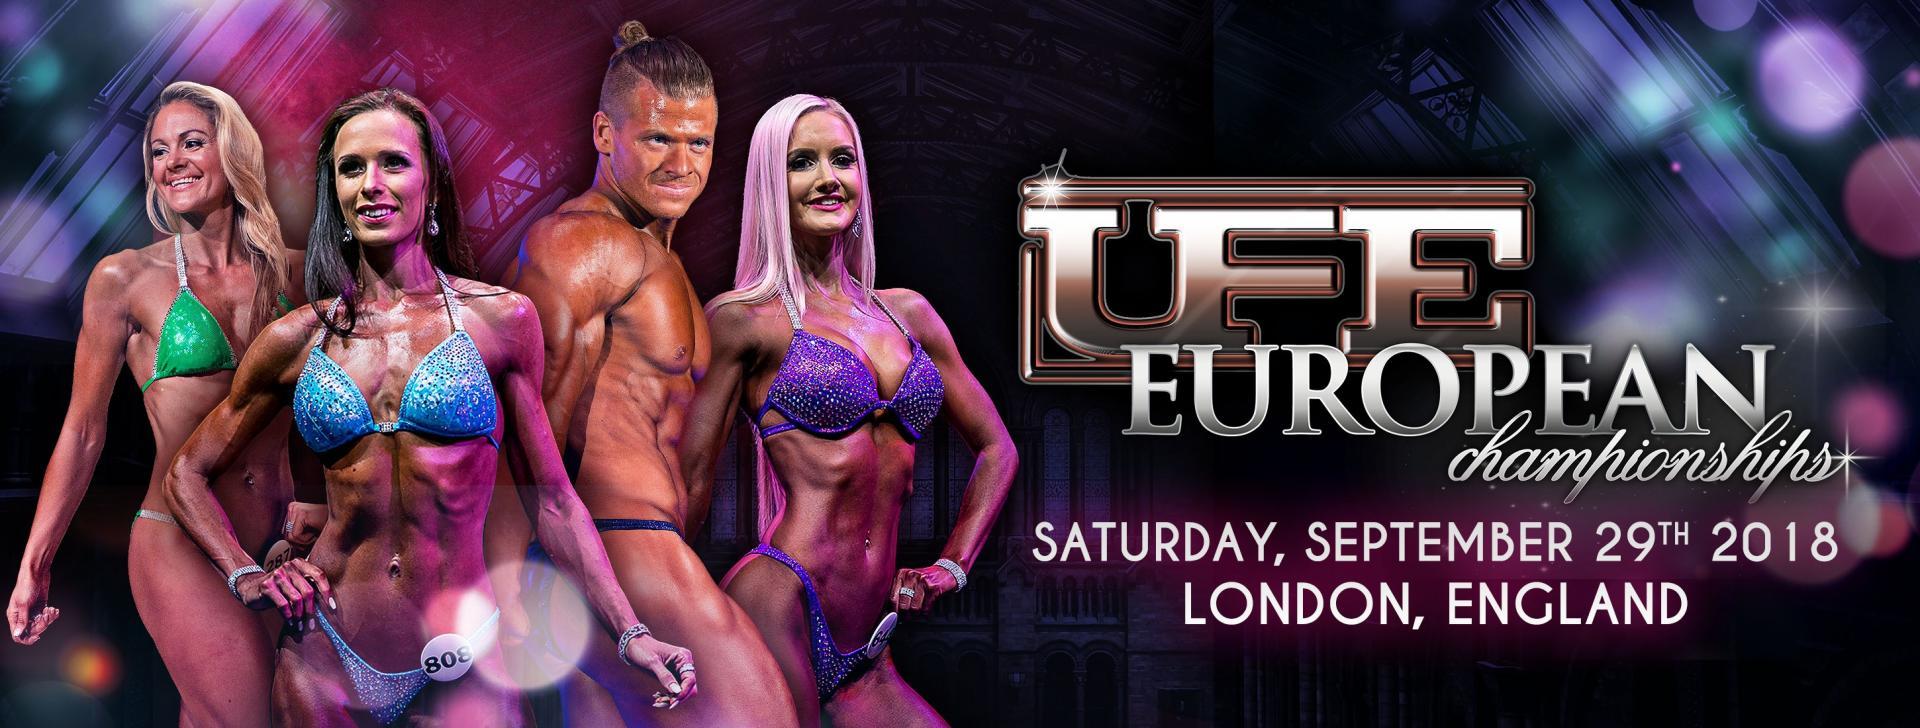 Euro champ 2018 web banner